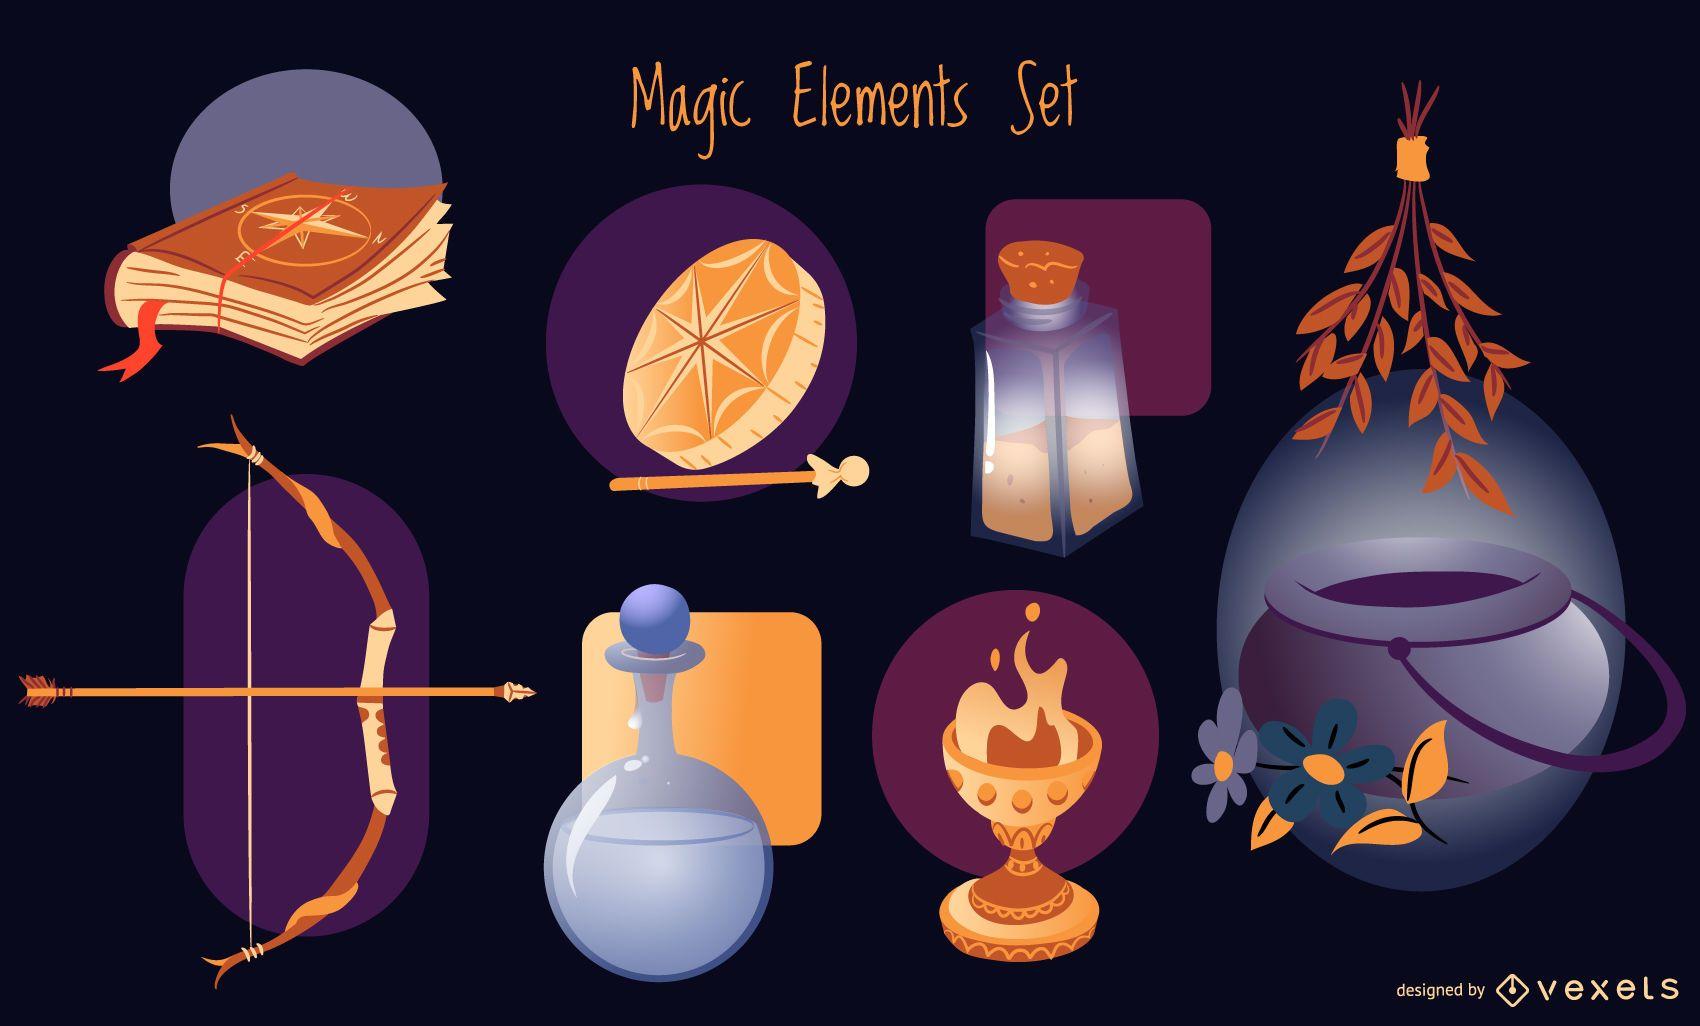 Magic elements illustration set